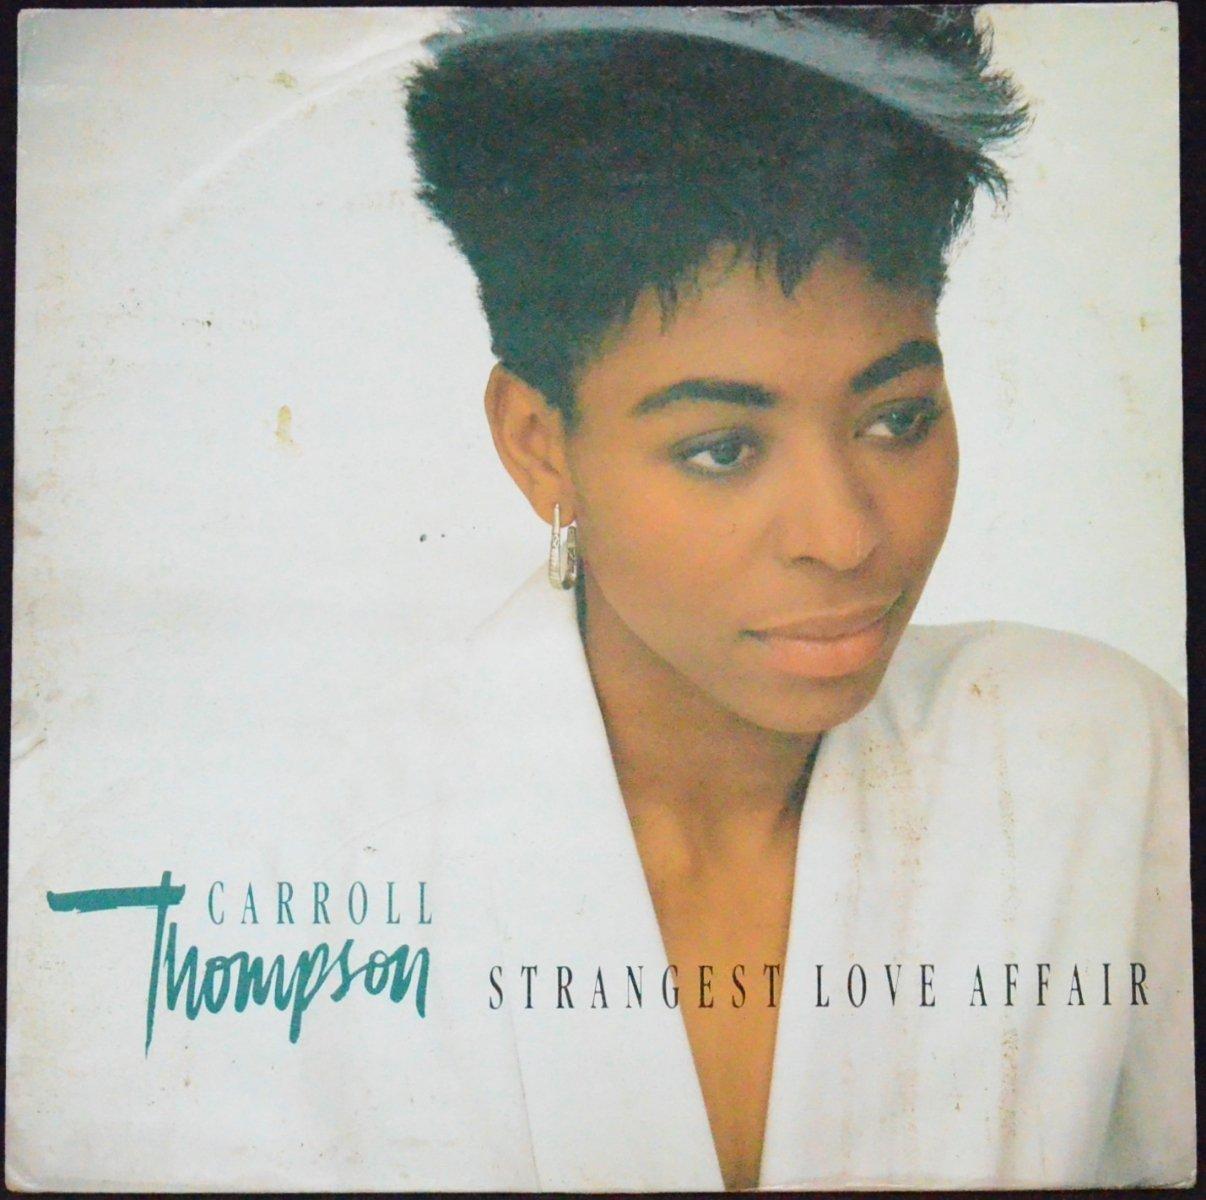 CARROLL THOMPSON / STRANGEST LOVE AFFAIR / TONIGHT (12